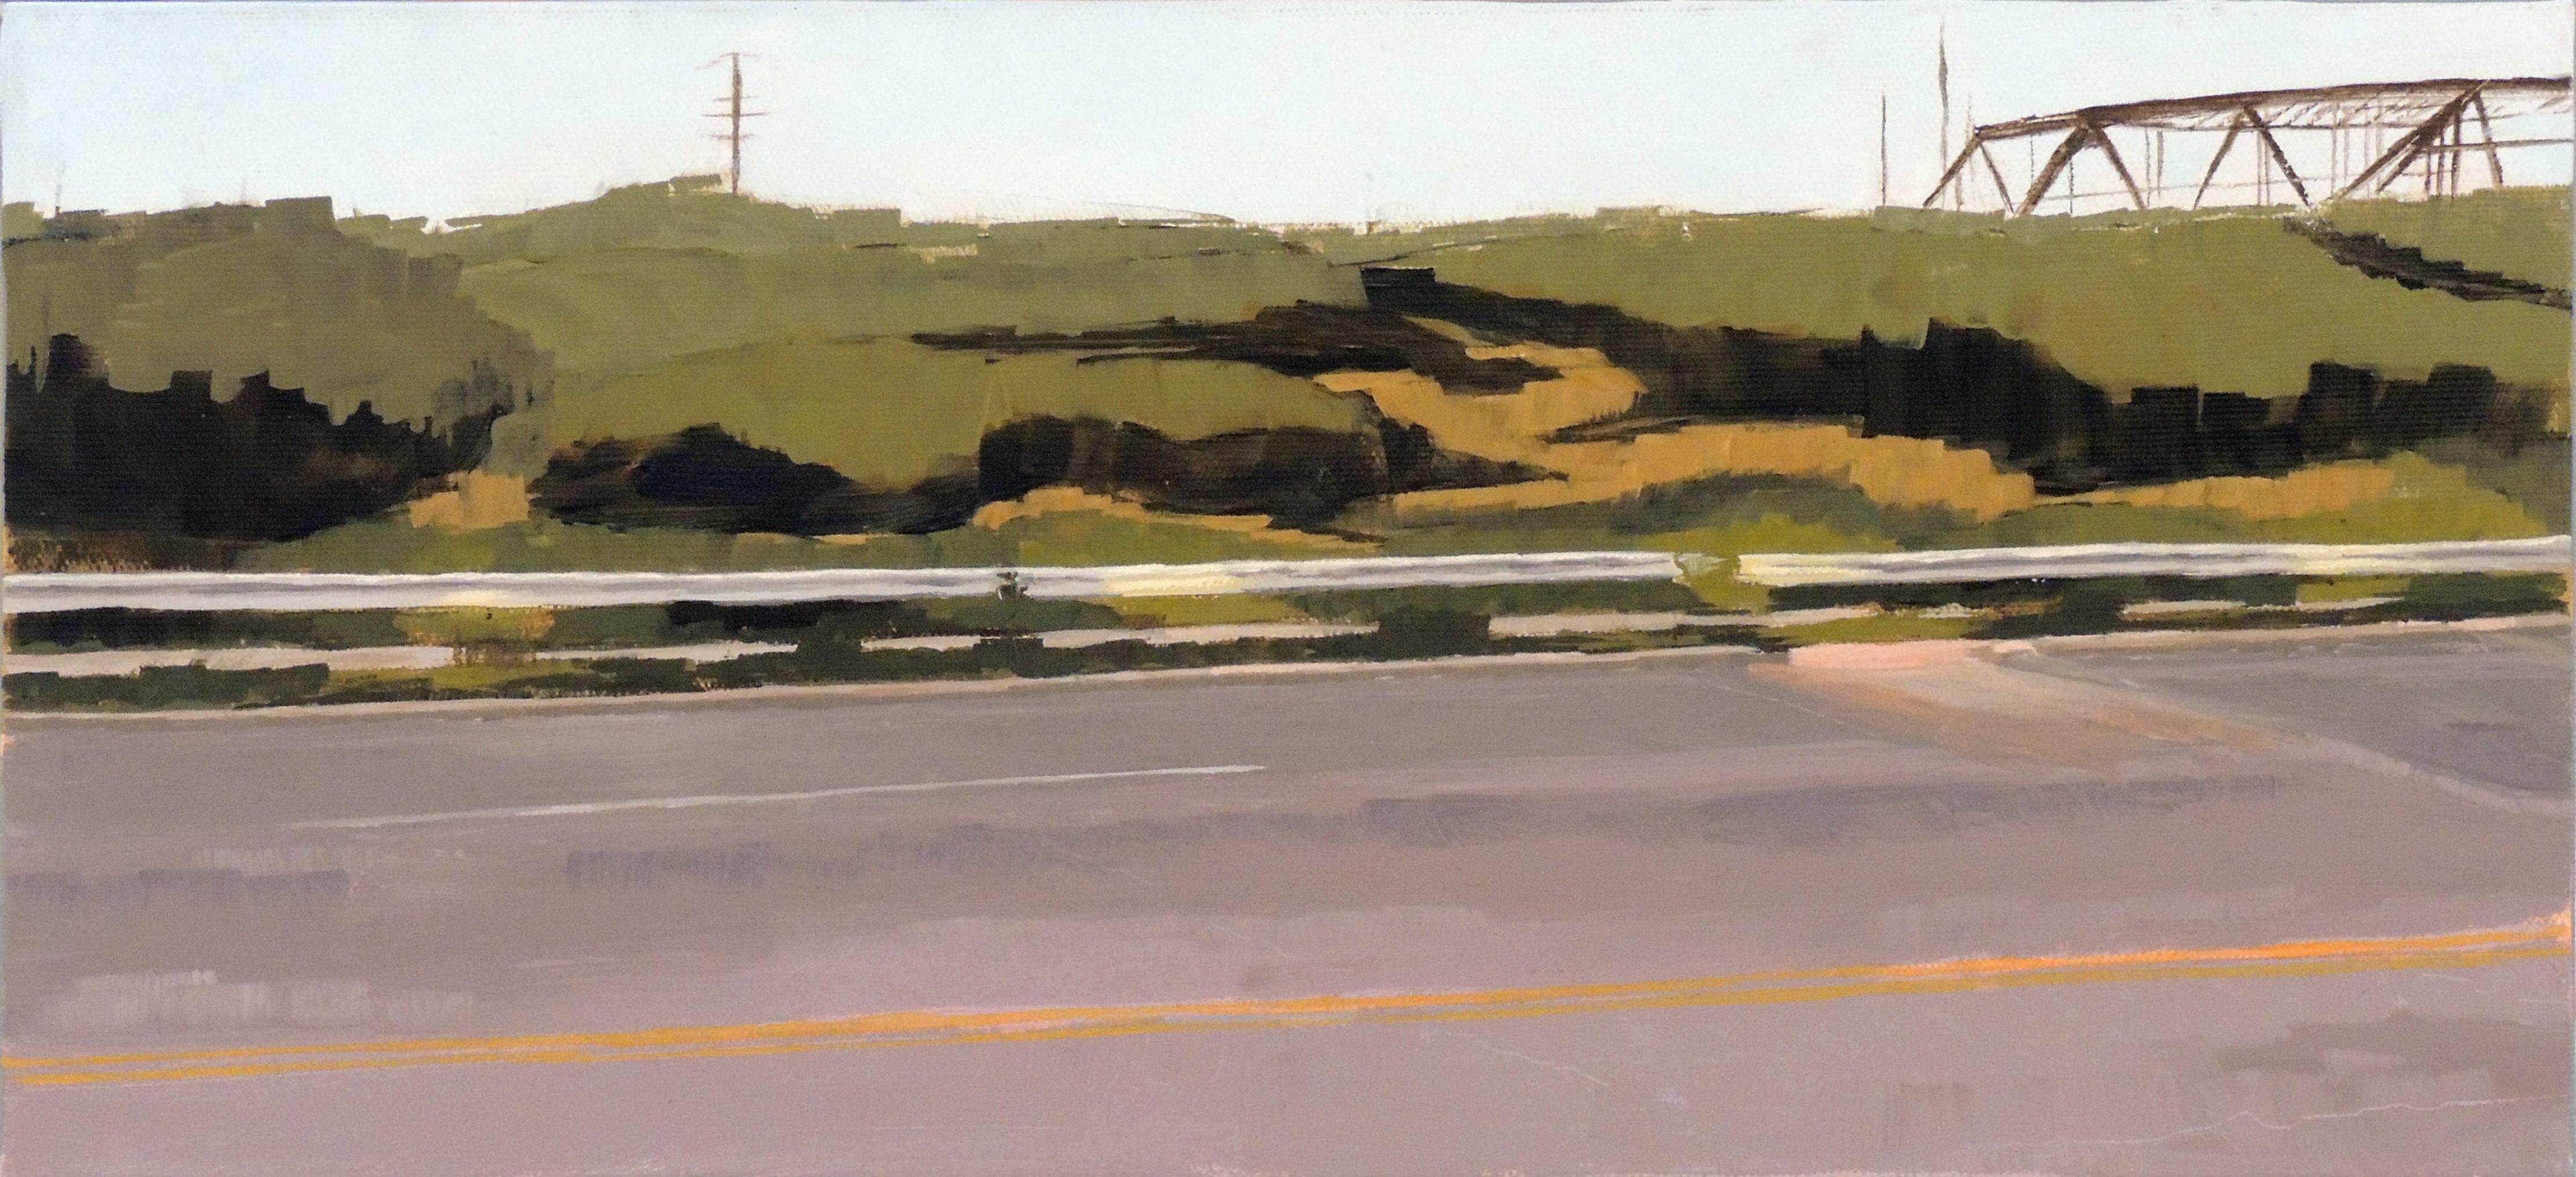 Kelley Booze | GUARDRAIL DRIVEBY | Oil on canvas